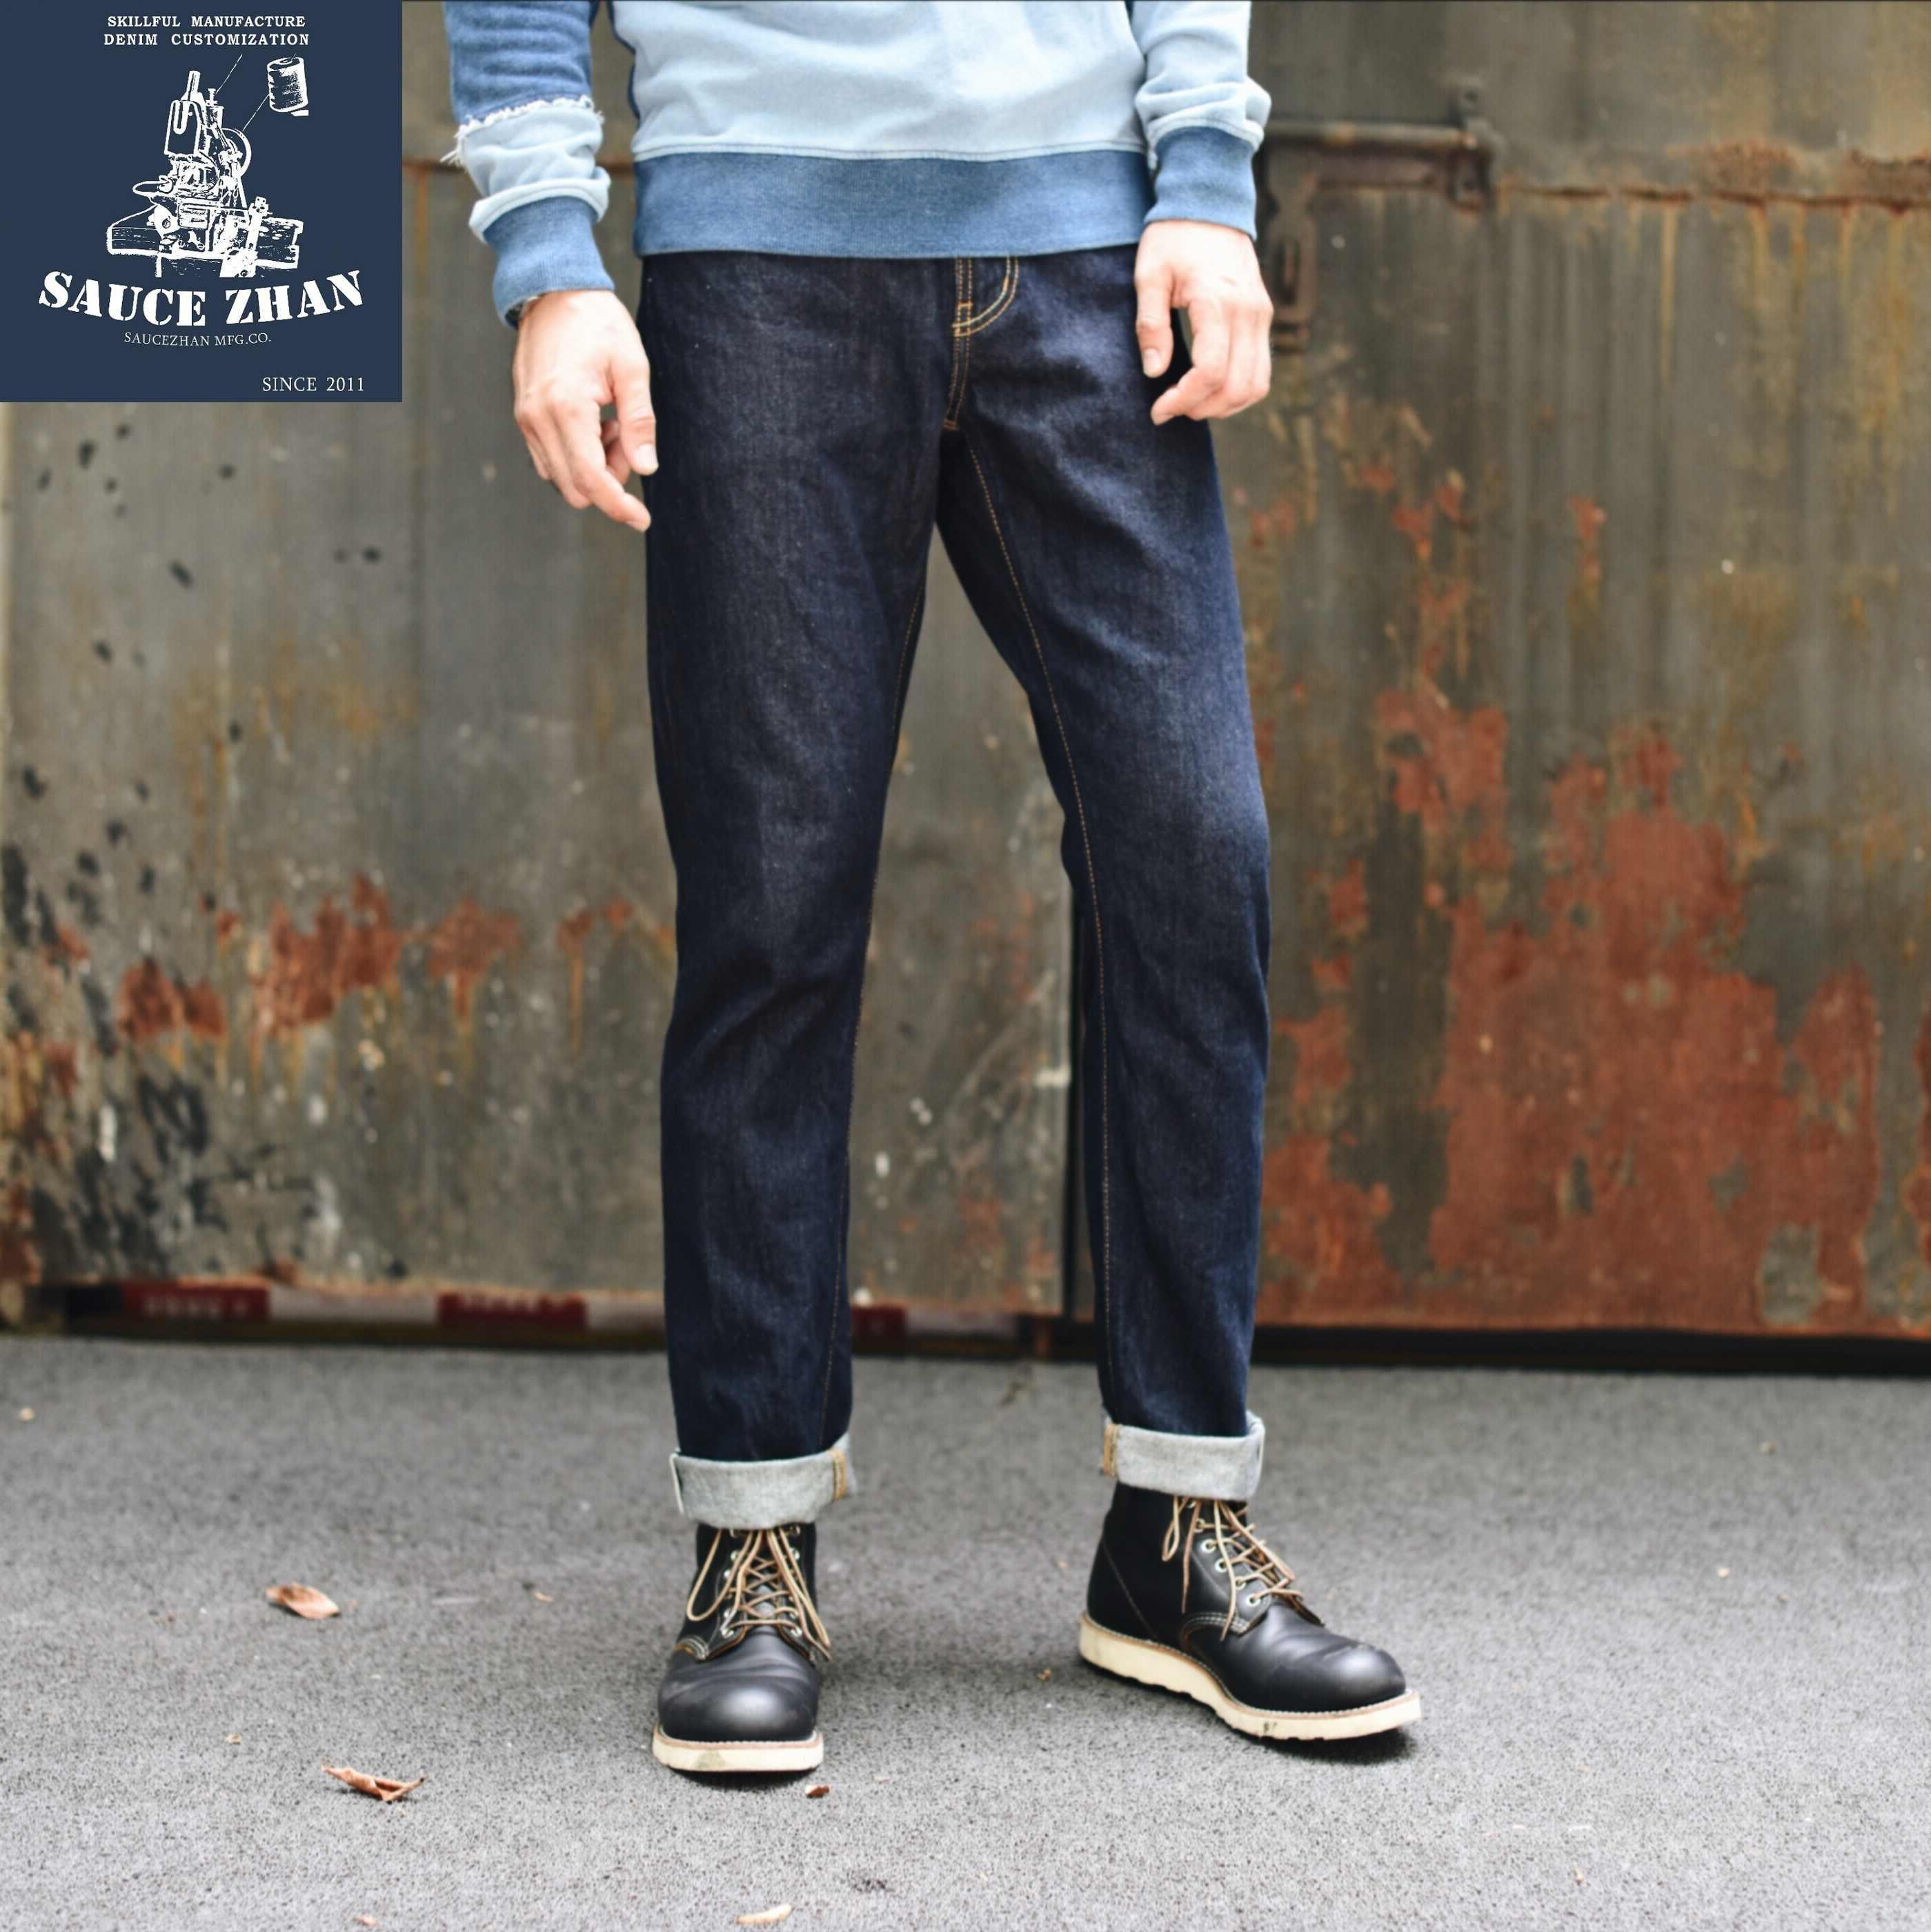 Saucezhan 314XX Mannen Jeans Zelfkant Jeans Zelfkant Denim Jeans Raw Denim Indigo Jeans Slim Fit Jeans Heren Jeans Merk